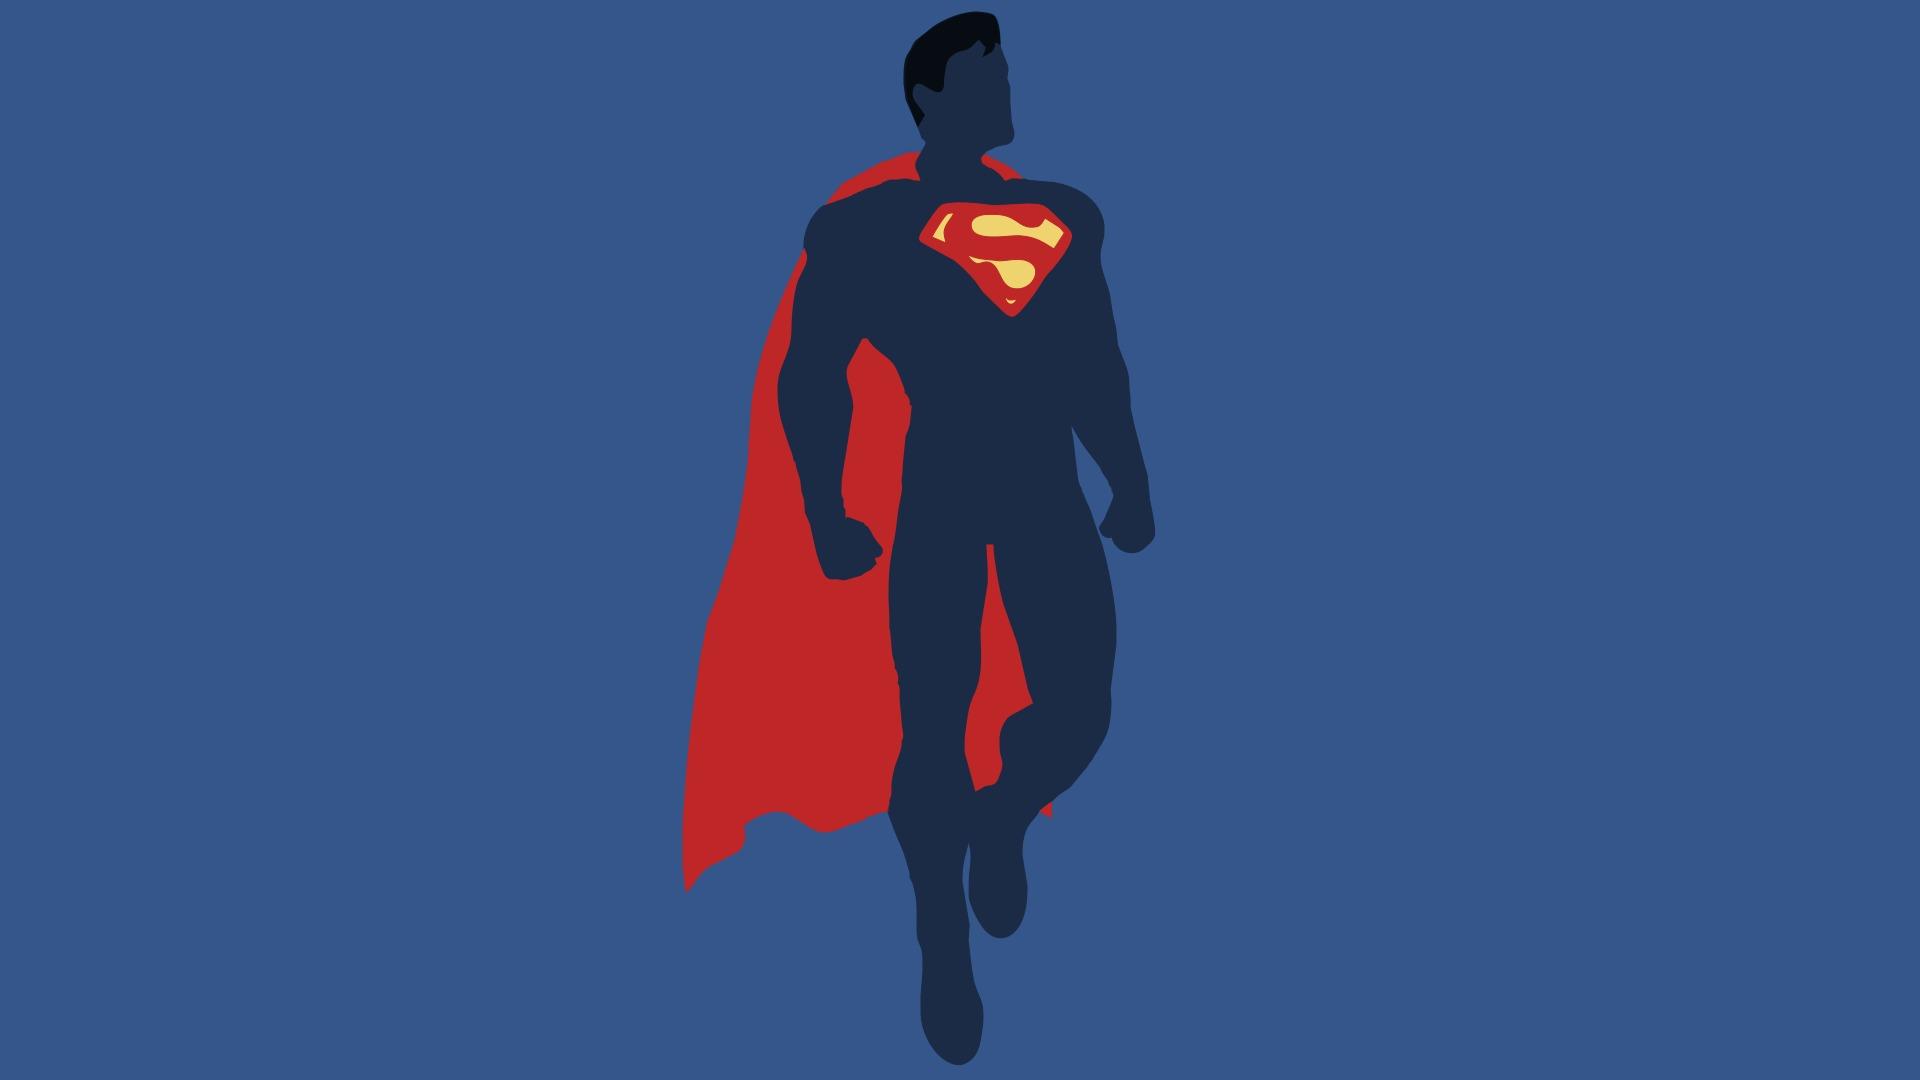 wallpaper : illustration, minimalism, superhero, dc comics, superman